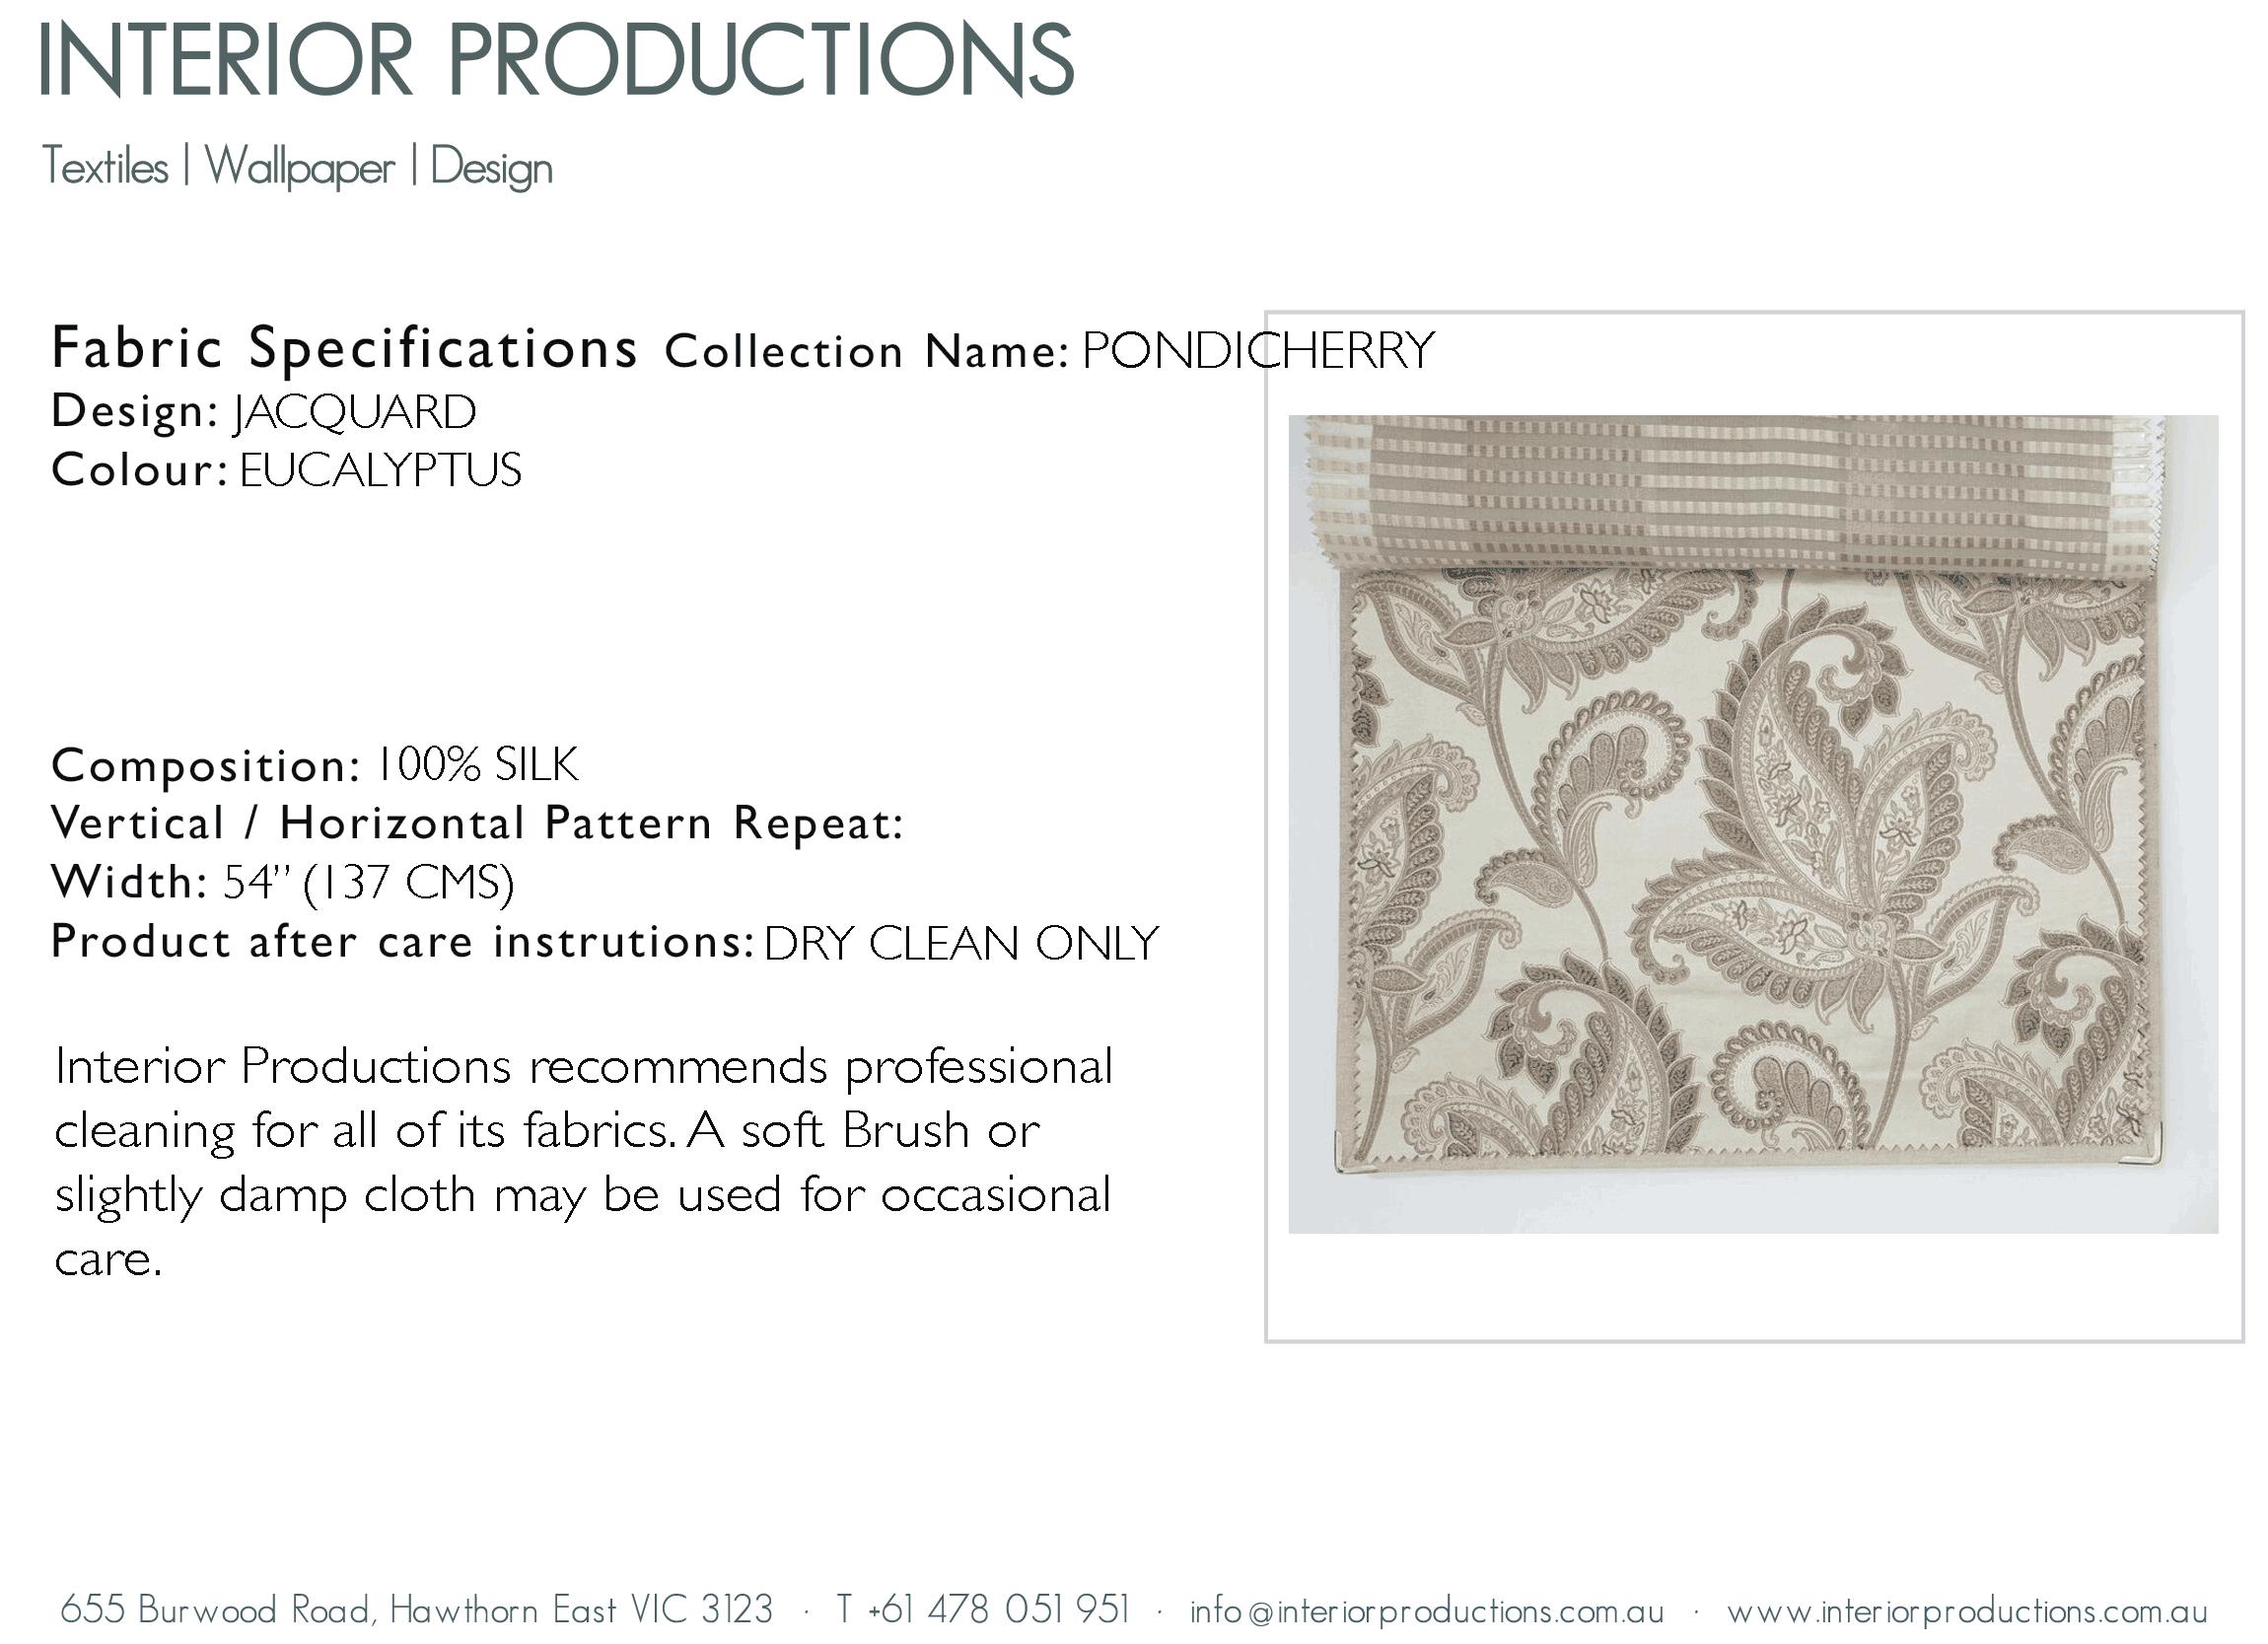 interior_productions_JACQUARD---EUCALYPTUS